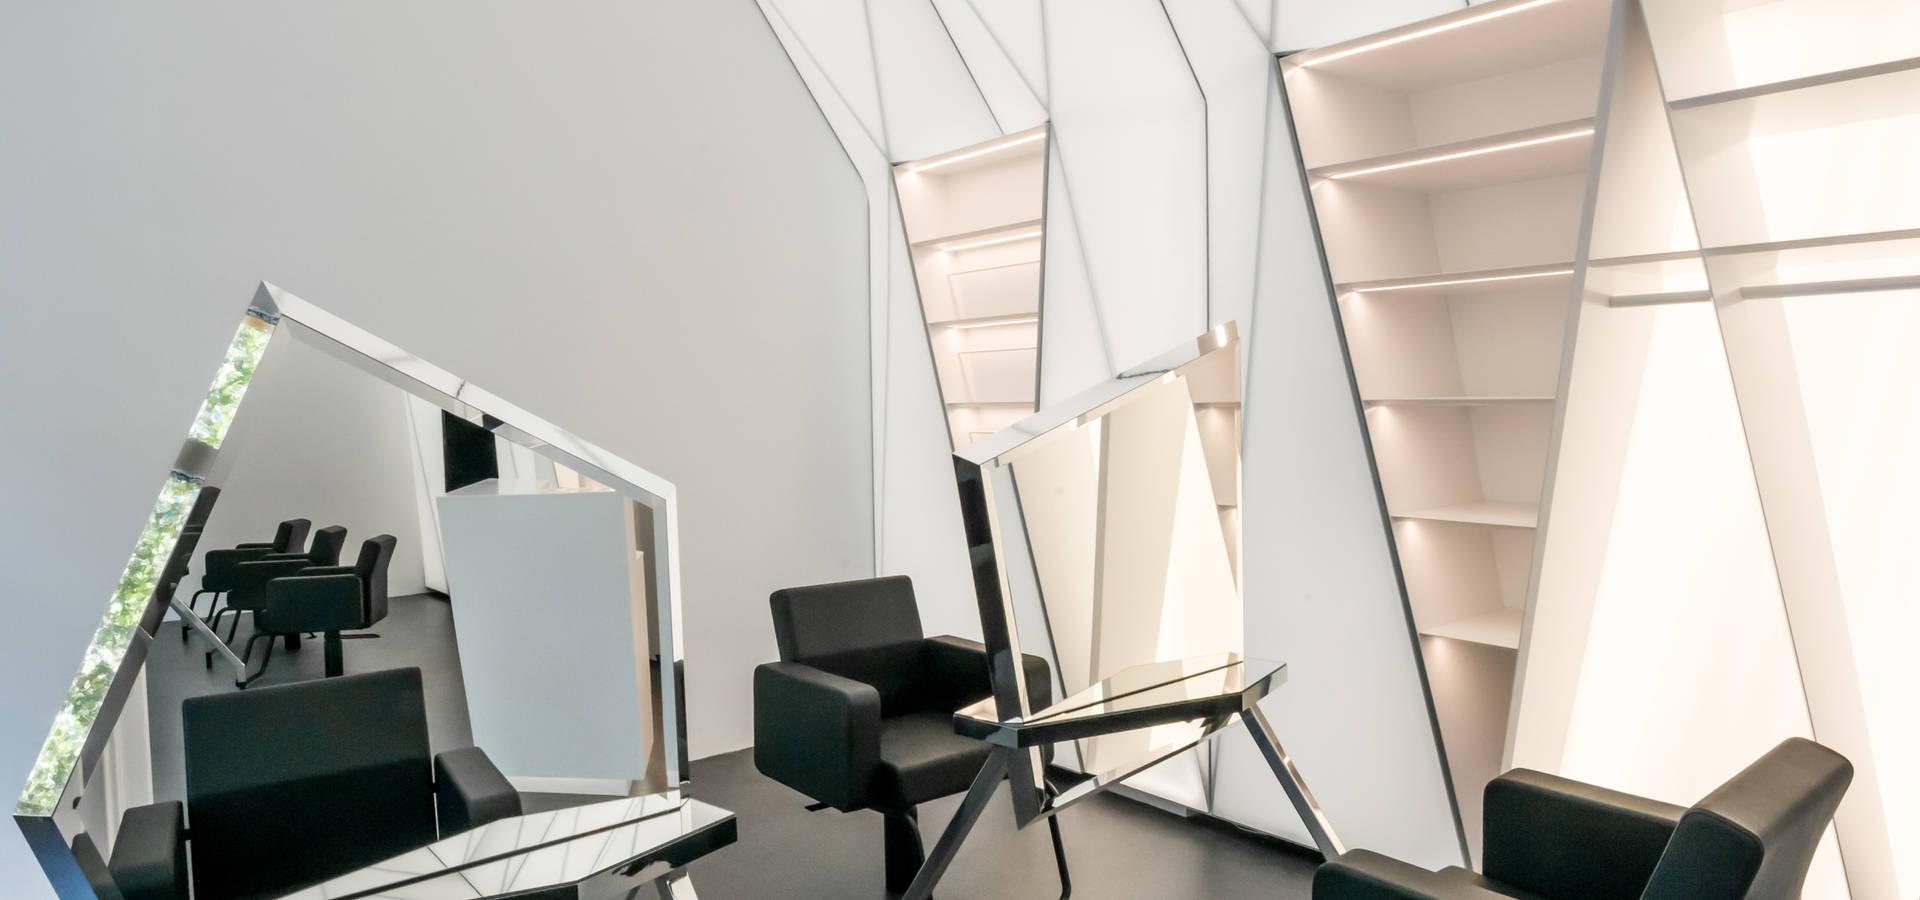 Architekturbüros Frankfurt tek to nik architekten generalplaner gmbh architekten in